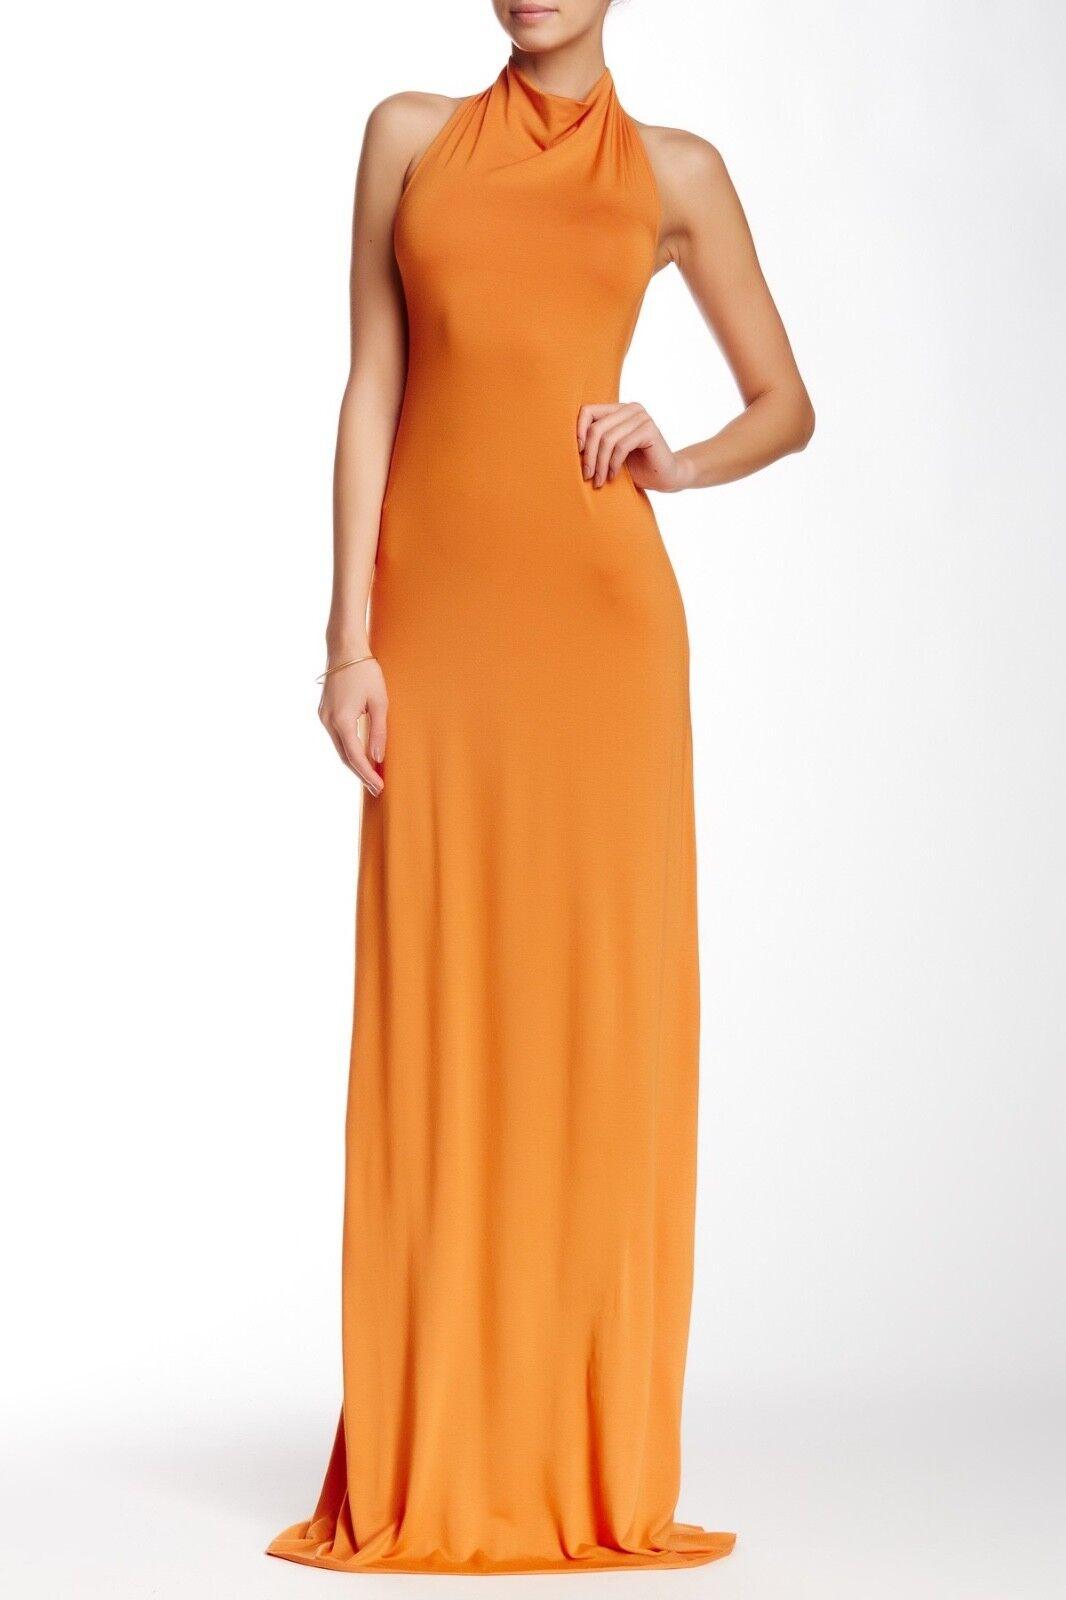 233 Rachel Pally-Women's Bellini Nicolas Dress Sz Sz Sz S ea8b29